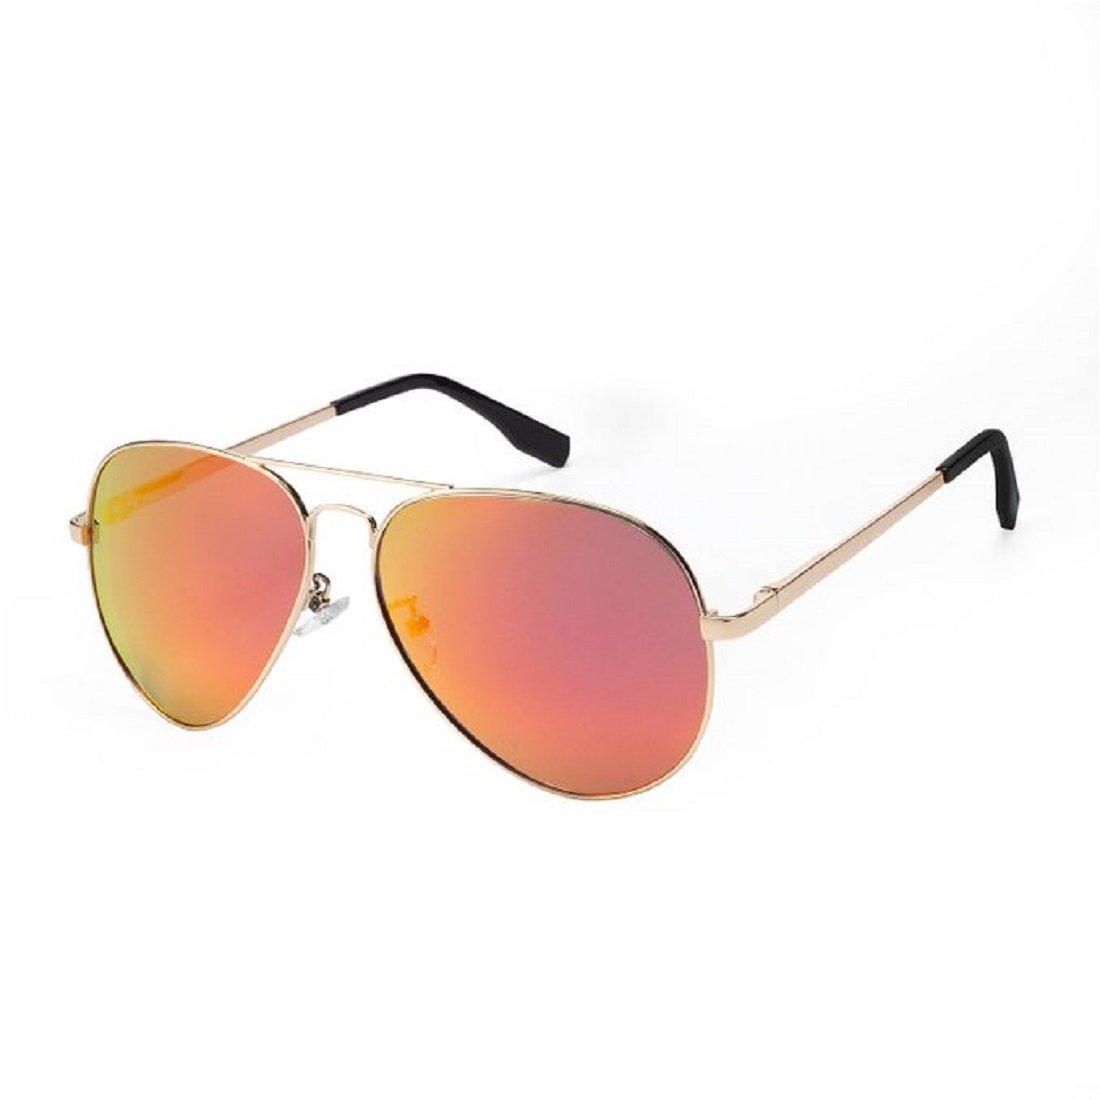 Feililong Prämie Voll Mirrored Pilotenbrille Flieger Sonnenbrille ...